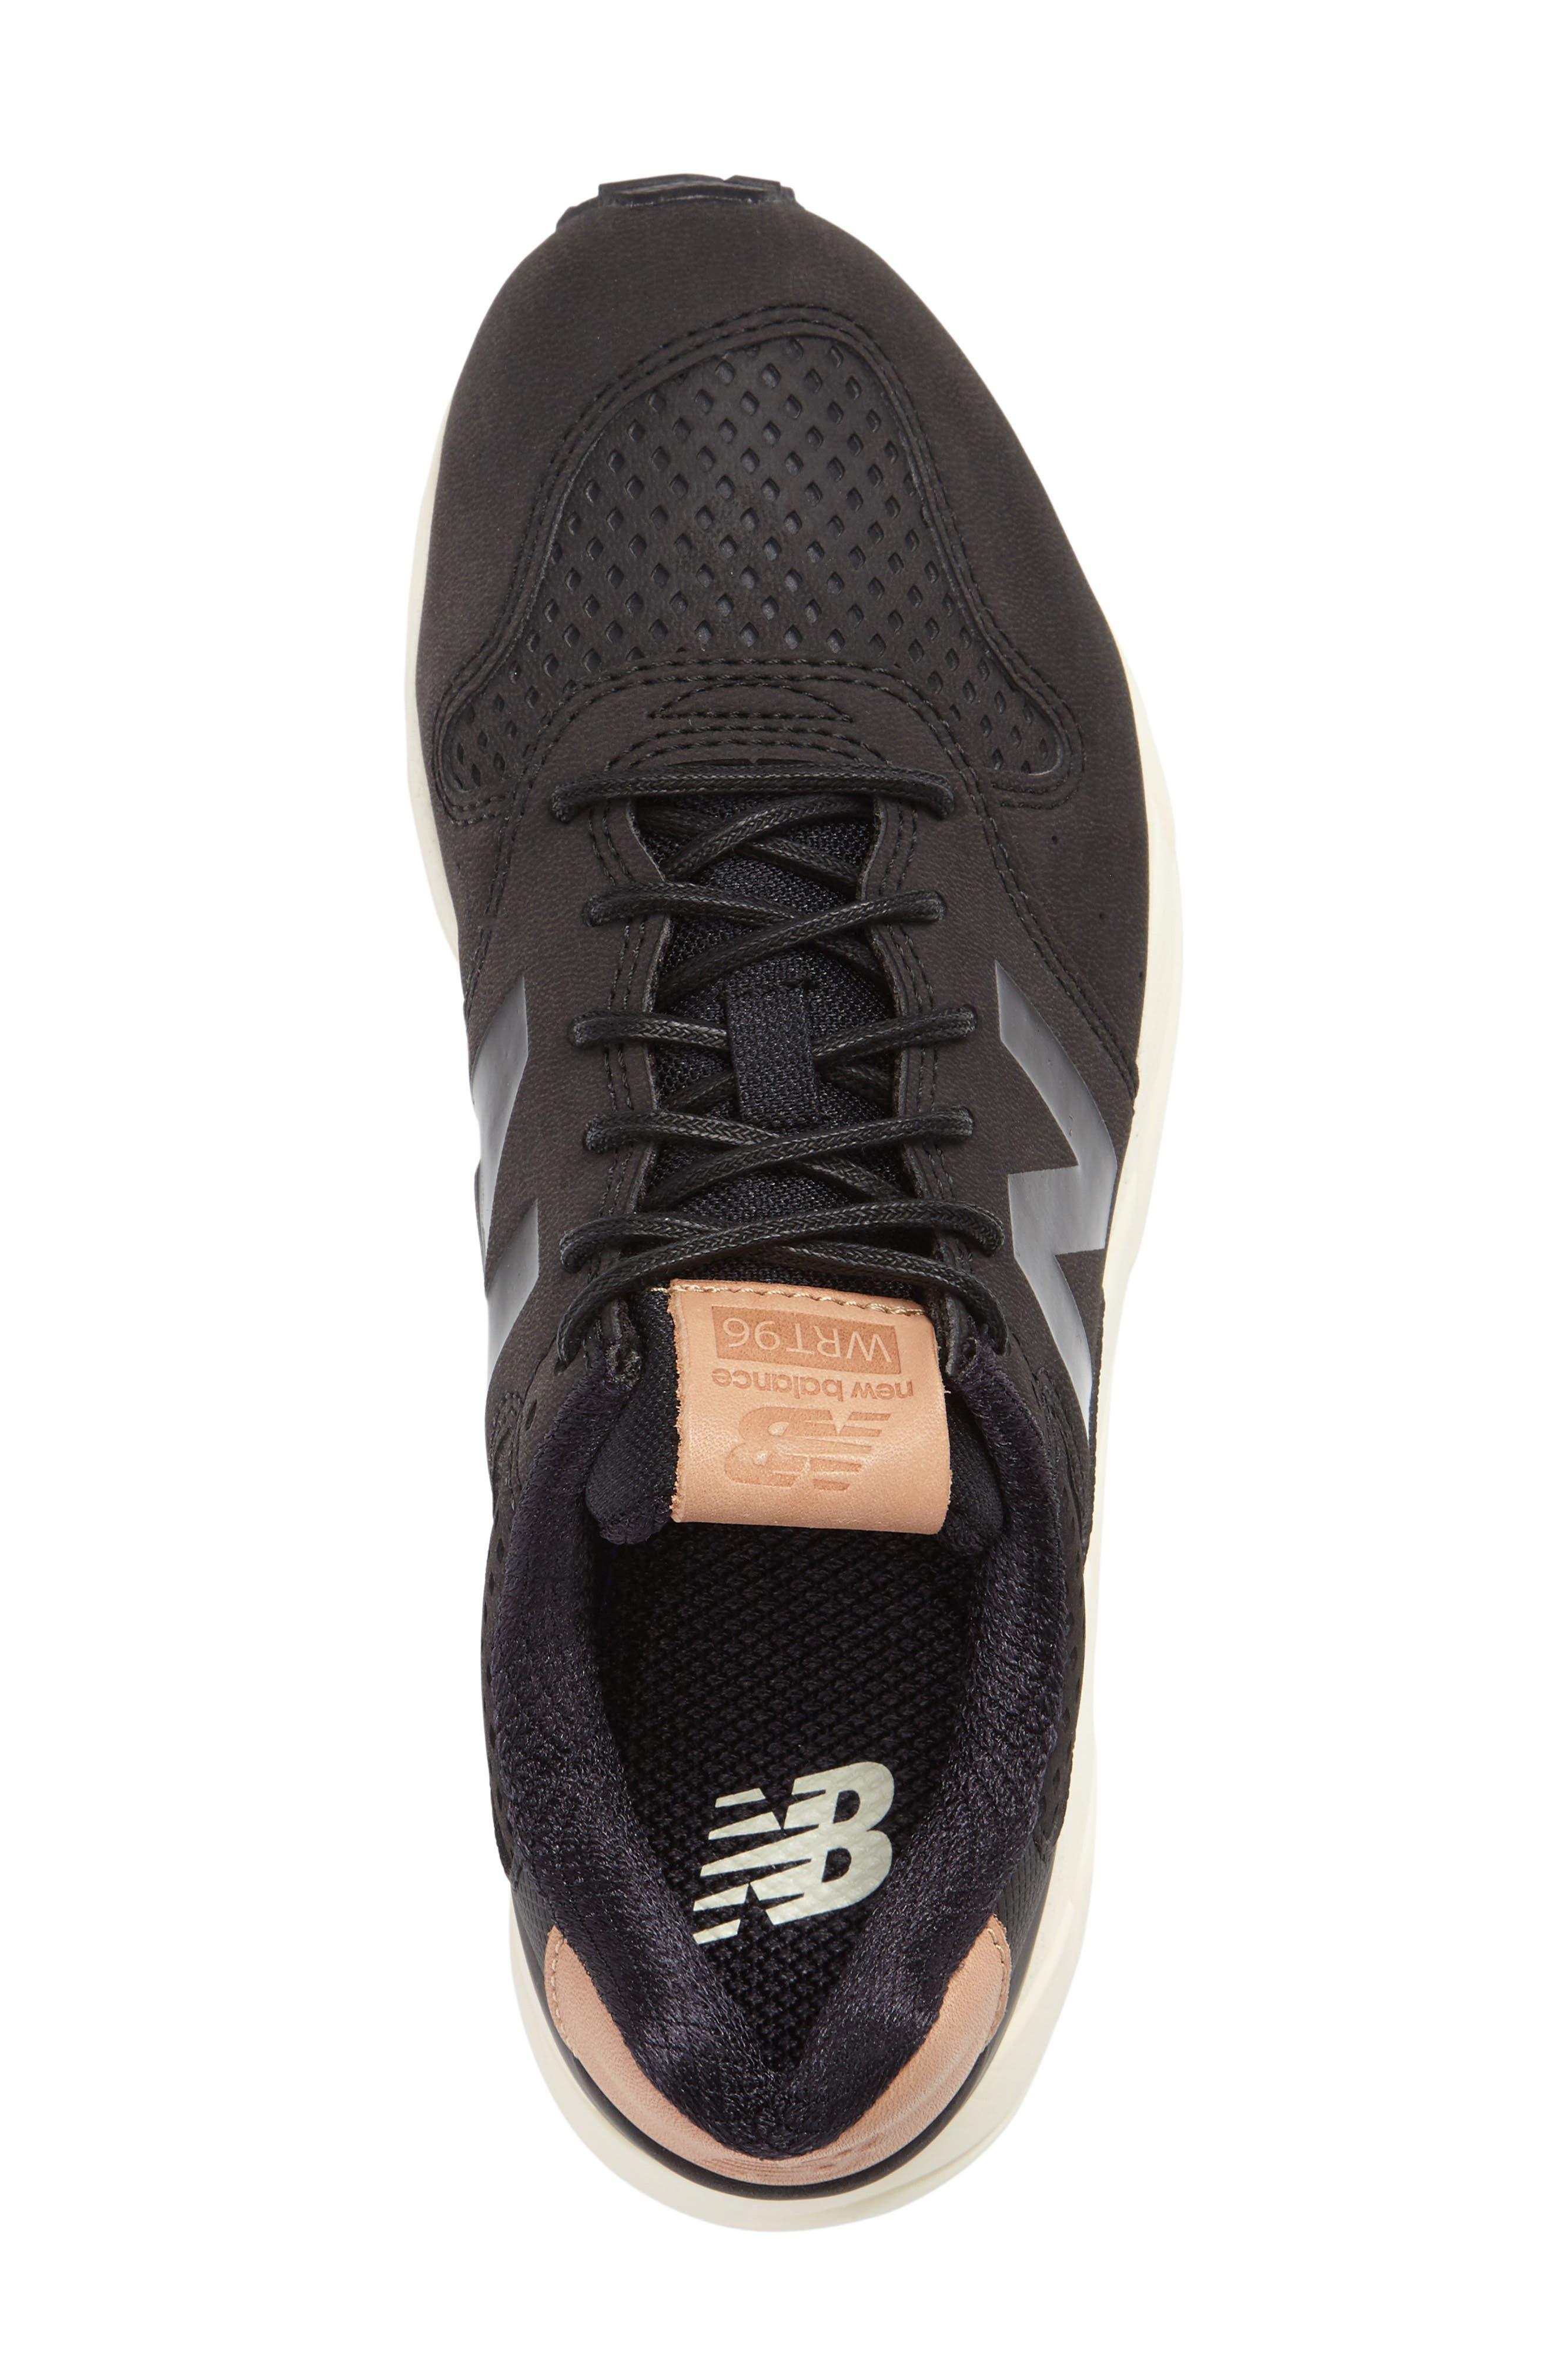 96 Mash-Up Sneaker,                             Alternate thumbnail 24, color,